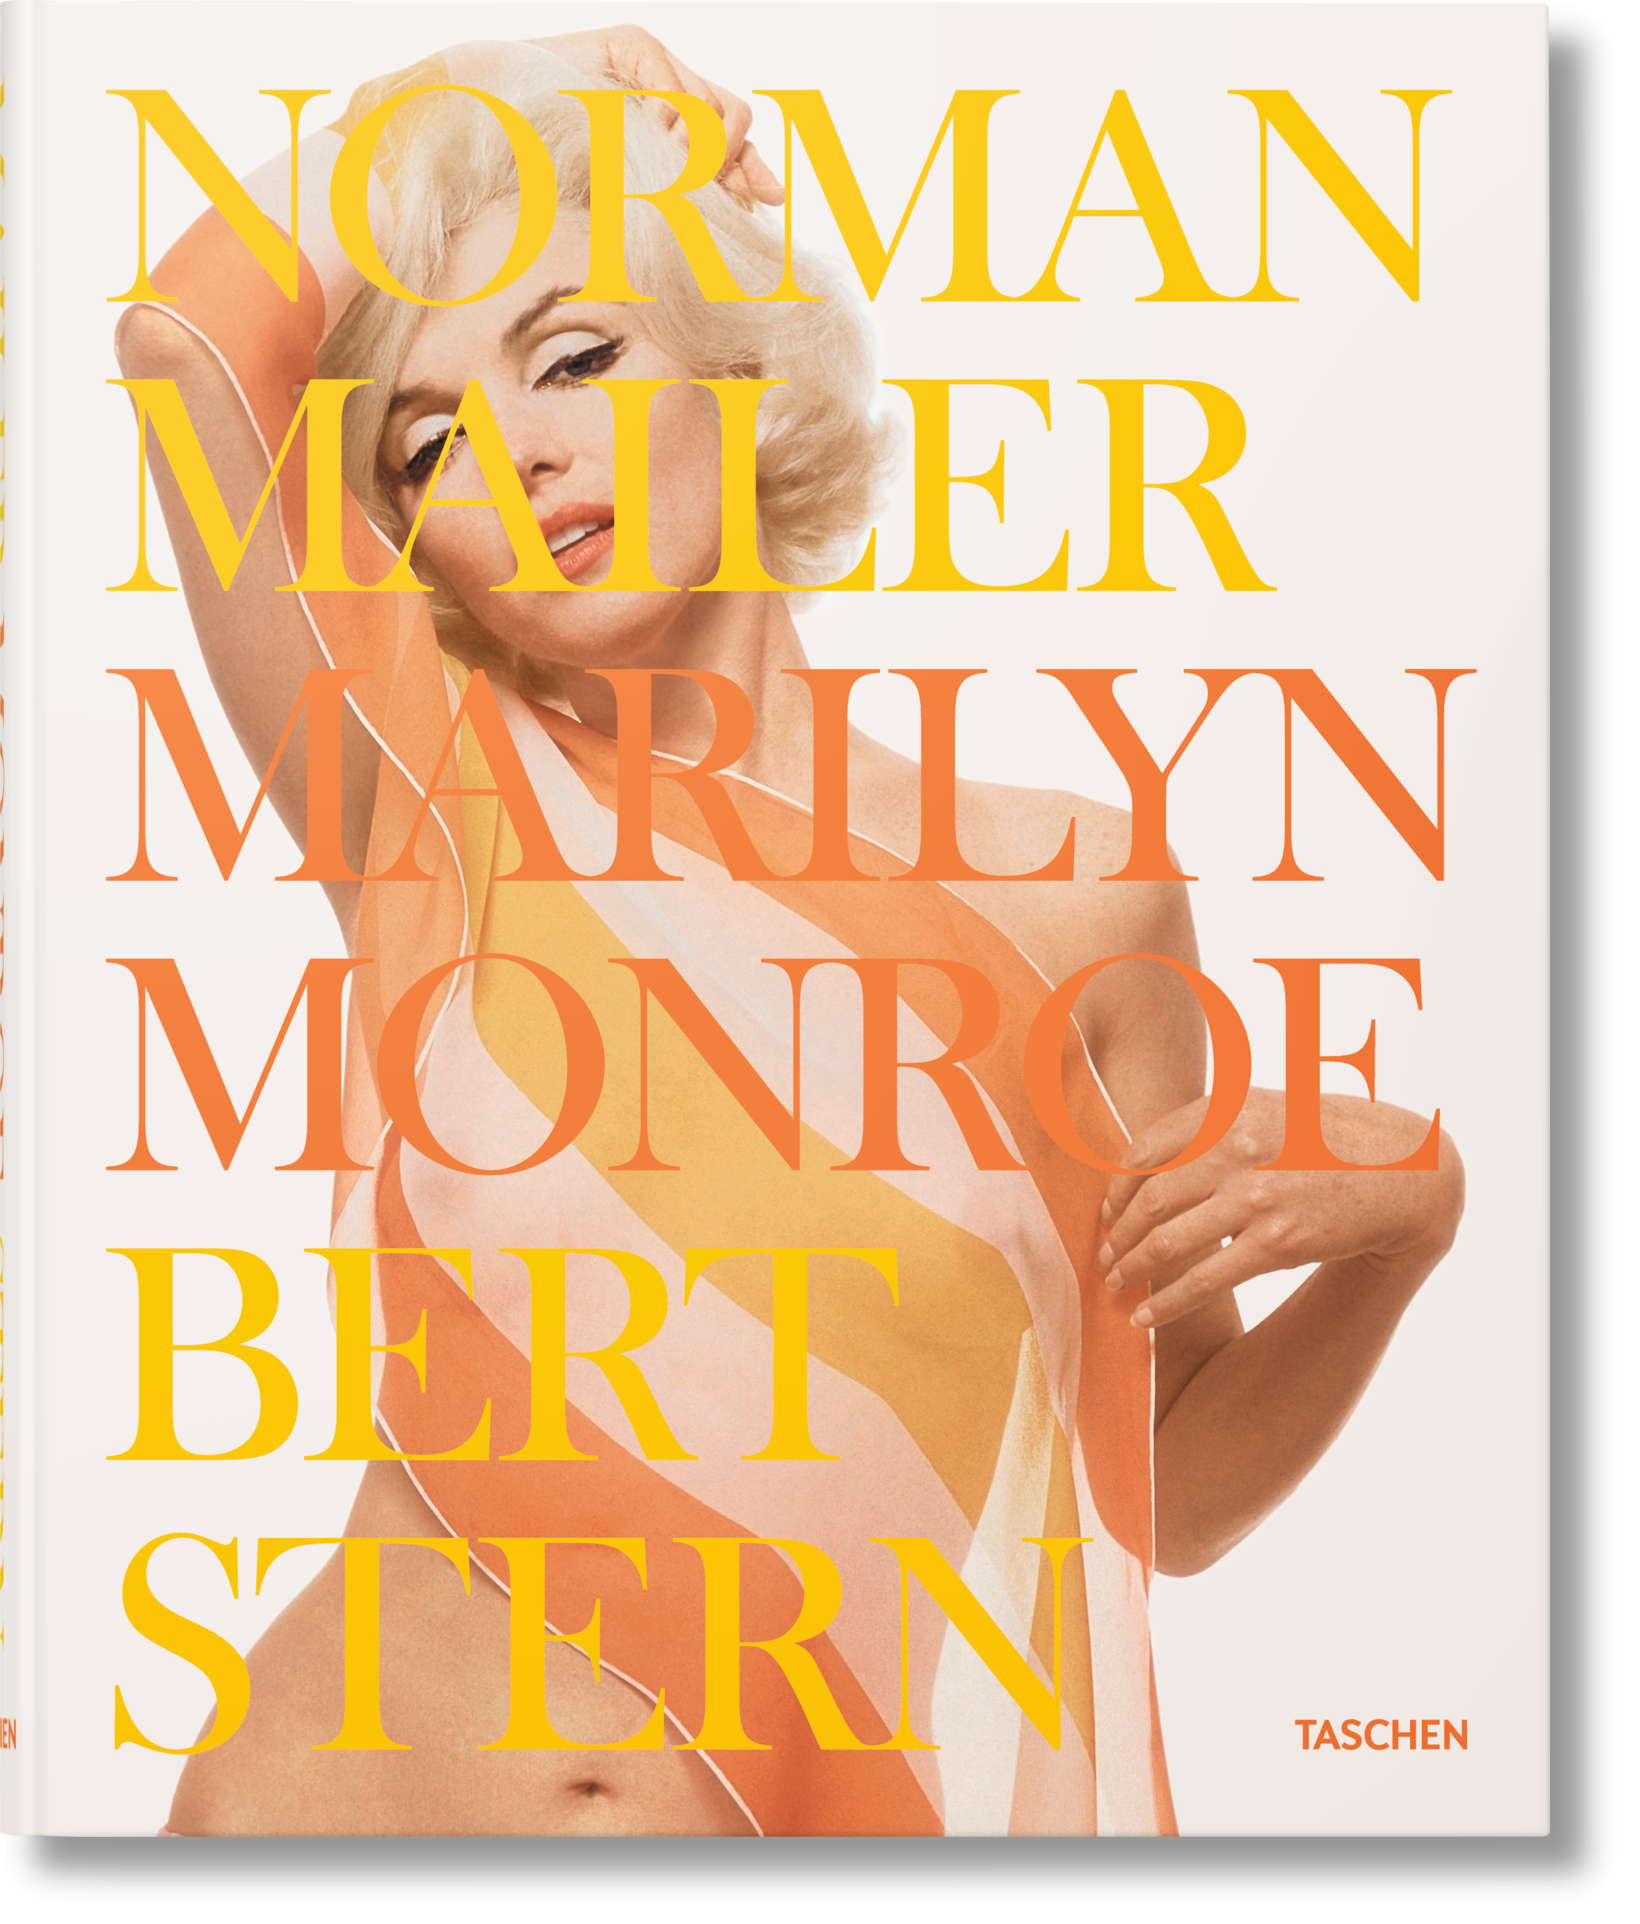 Norman Mailer - Marilyn Monroe